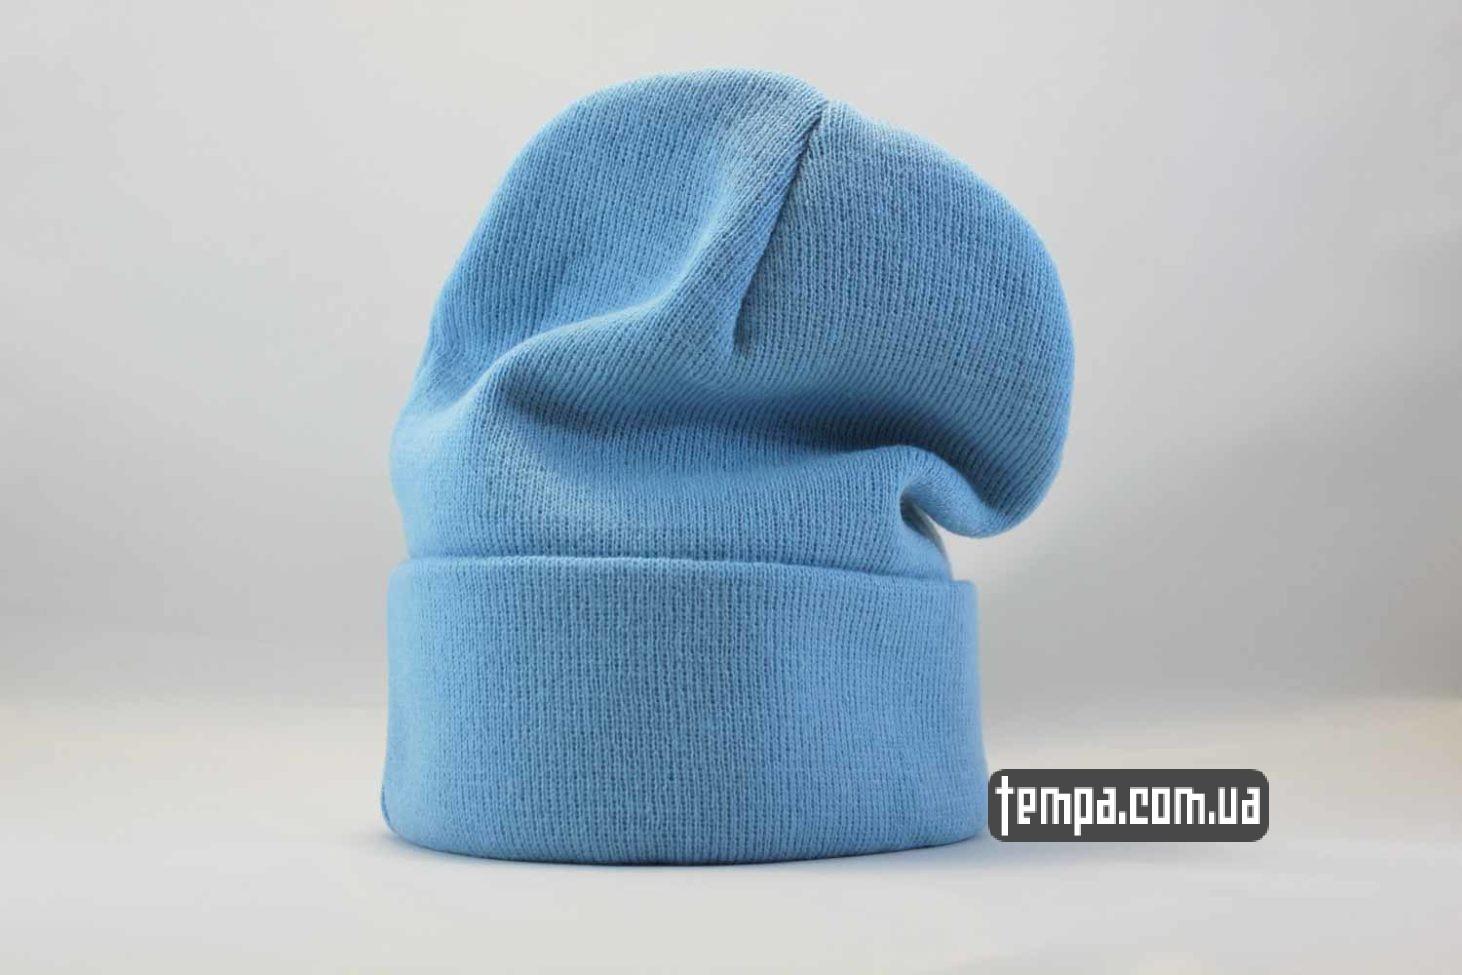 купить supreme одежда магазин оригниал шапка beanie supreme blue голубая supream магазин